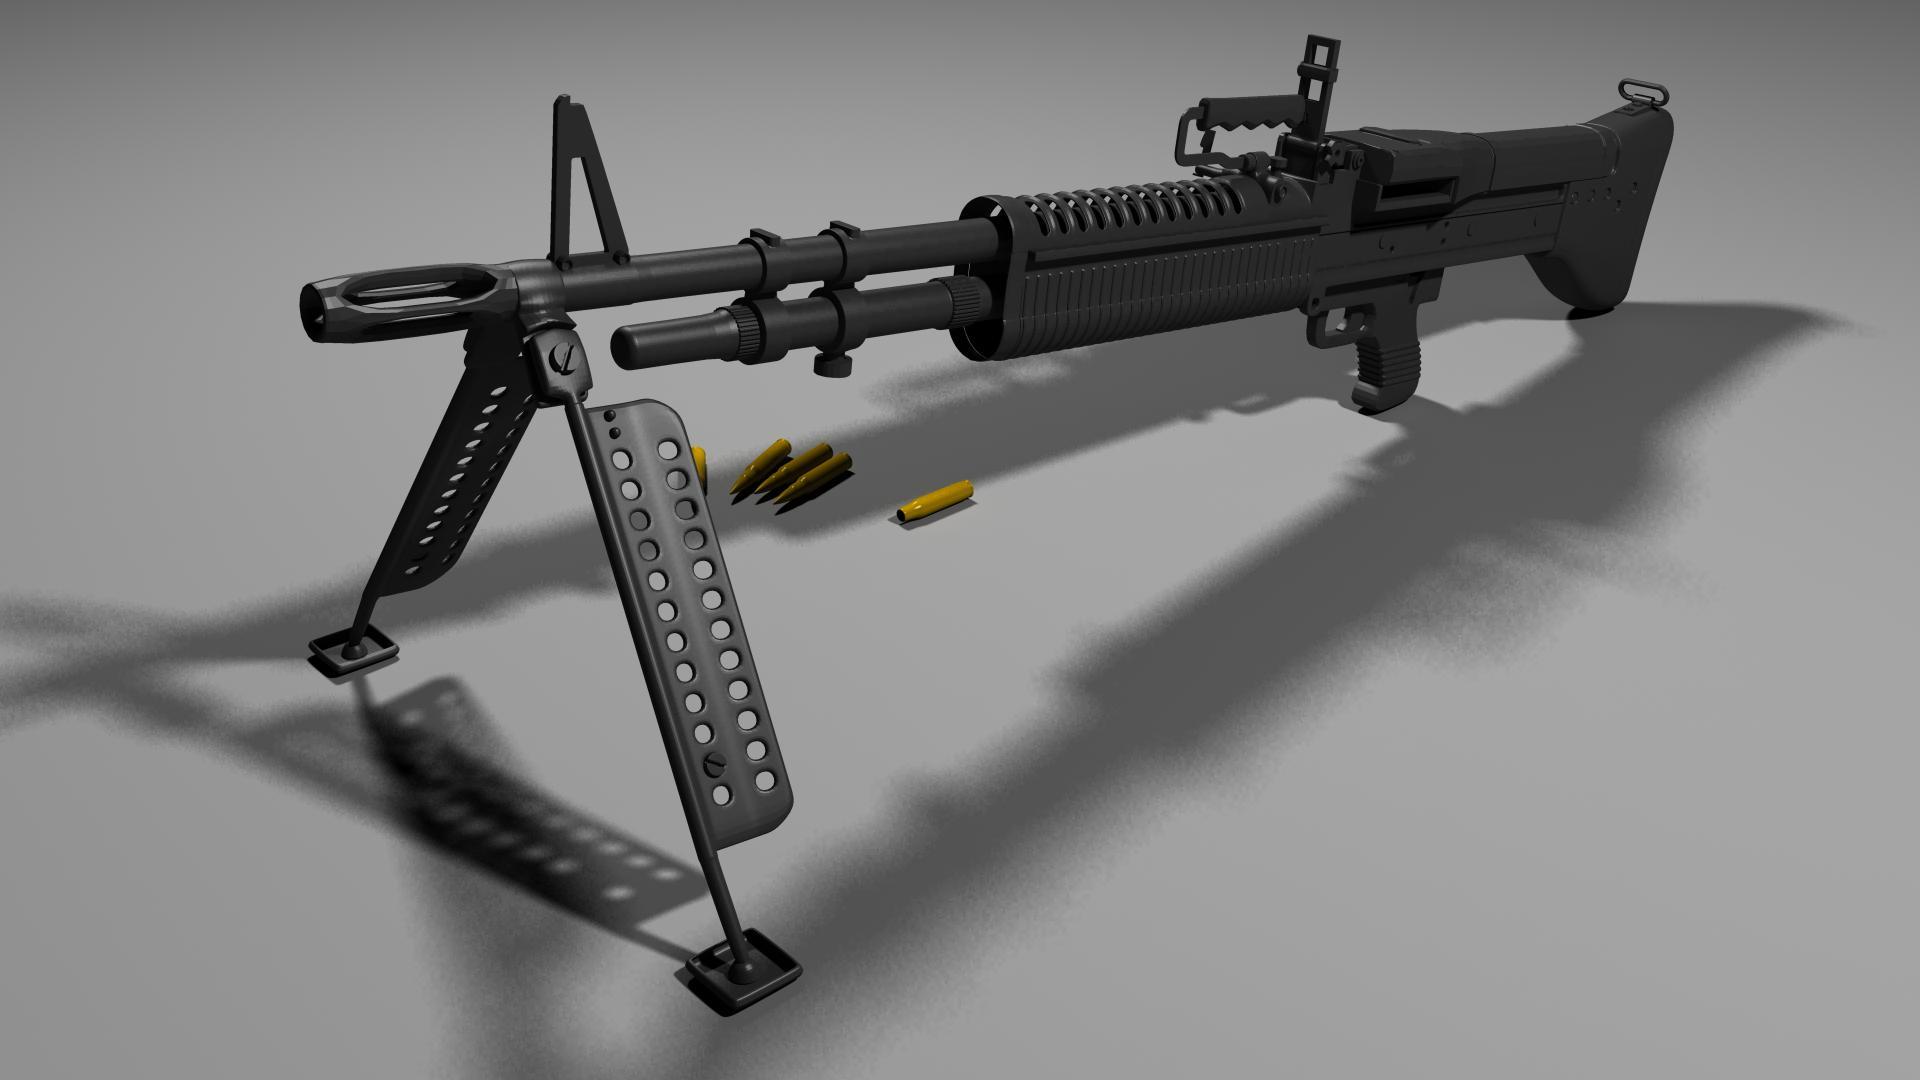 M60 MACHINE GUN military rifle weapon ge wallpaper background 1920x1080